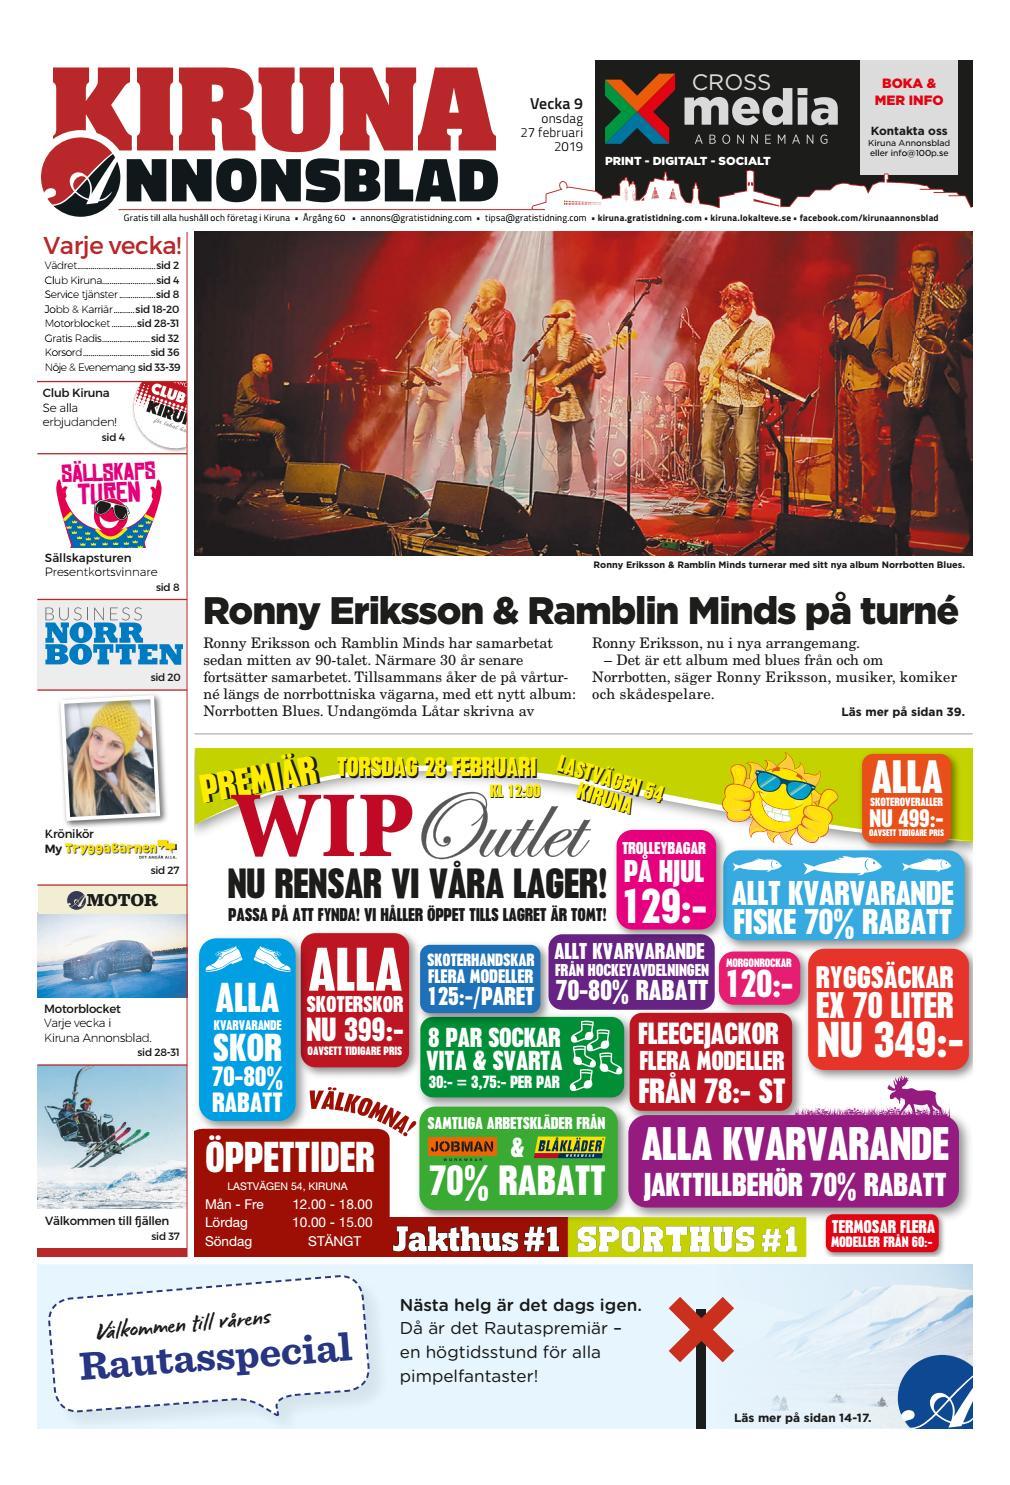 9177918fb2b6 Kiruna Annonsblad vecka 09, 2019 by Svenska Civildatalogerna AB - issuu